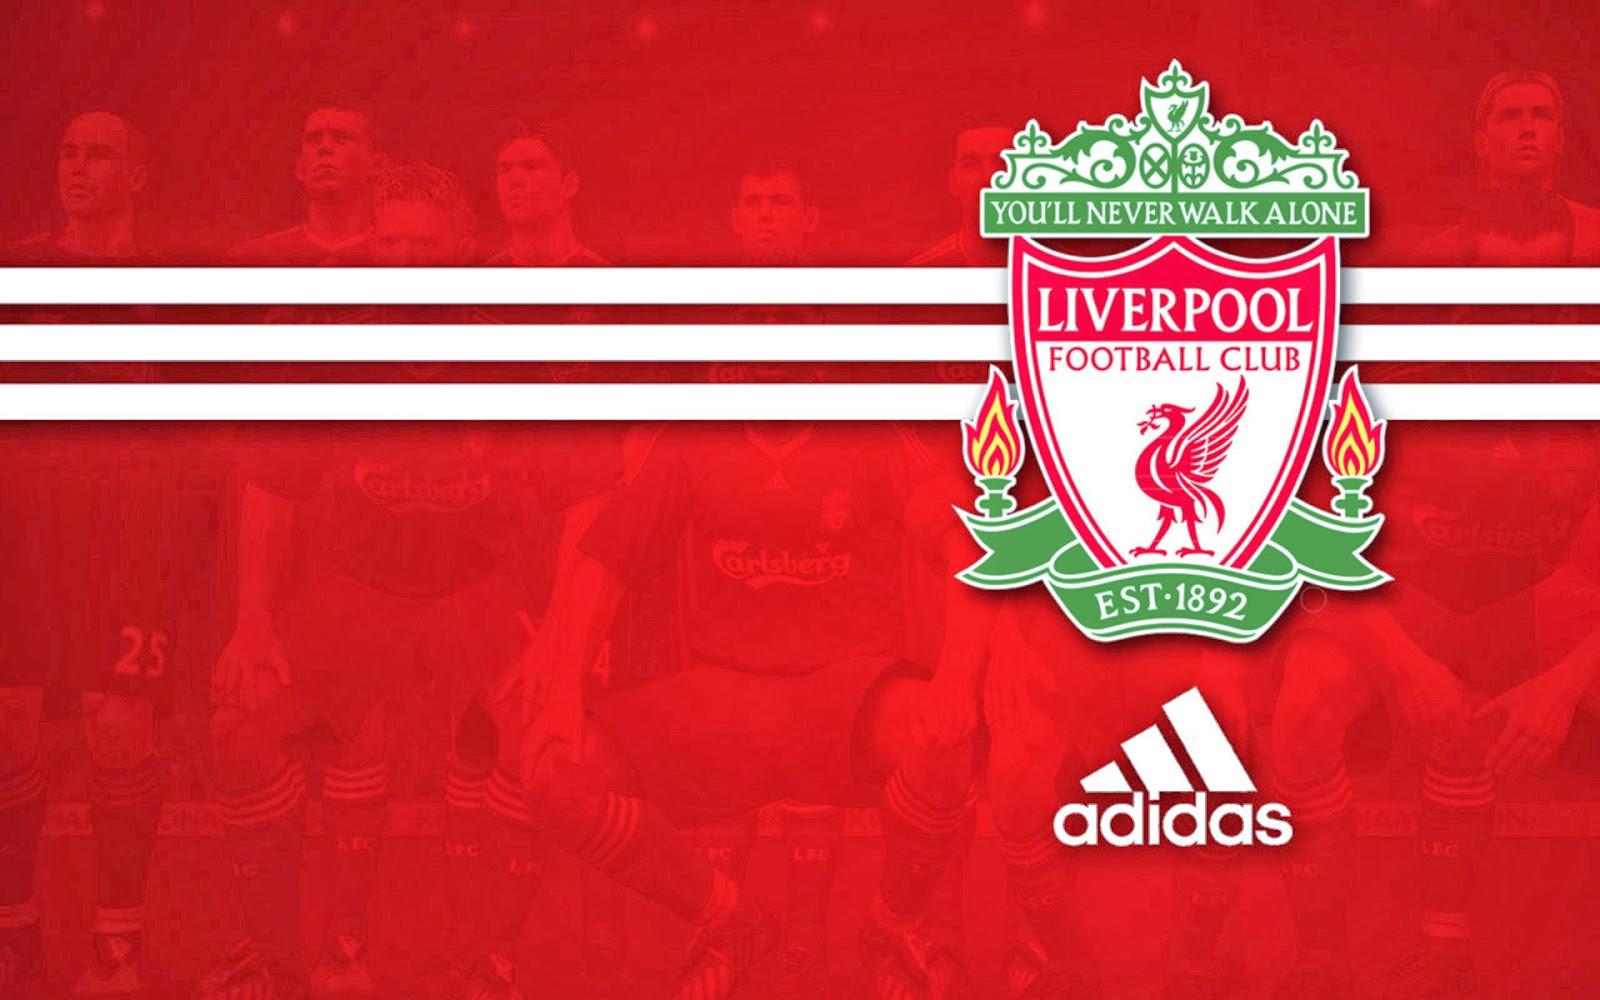 47+ Liverpool FC Wallpaper 2015 on WallpaperSafari